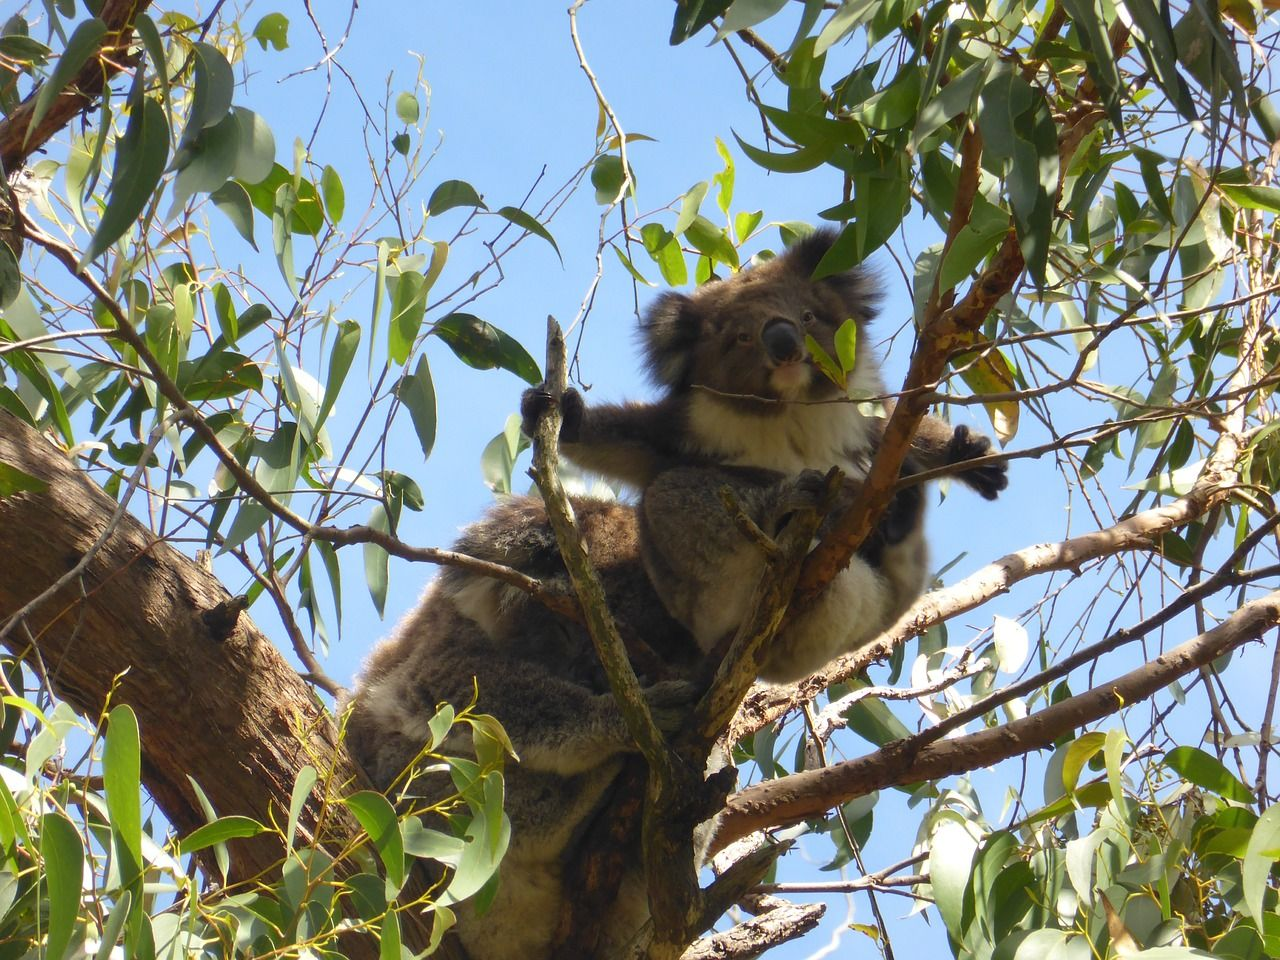 Australia Koala Gumtree Australia Wildlife Australia Koala